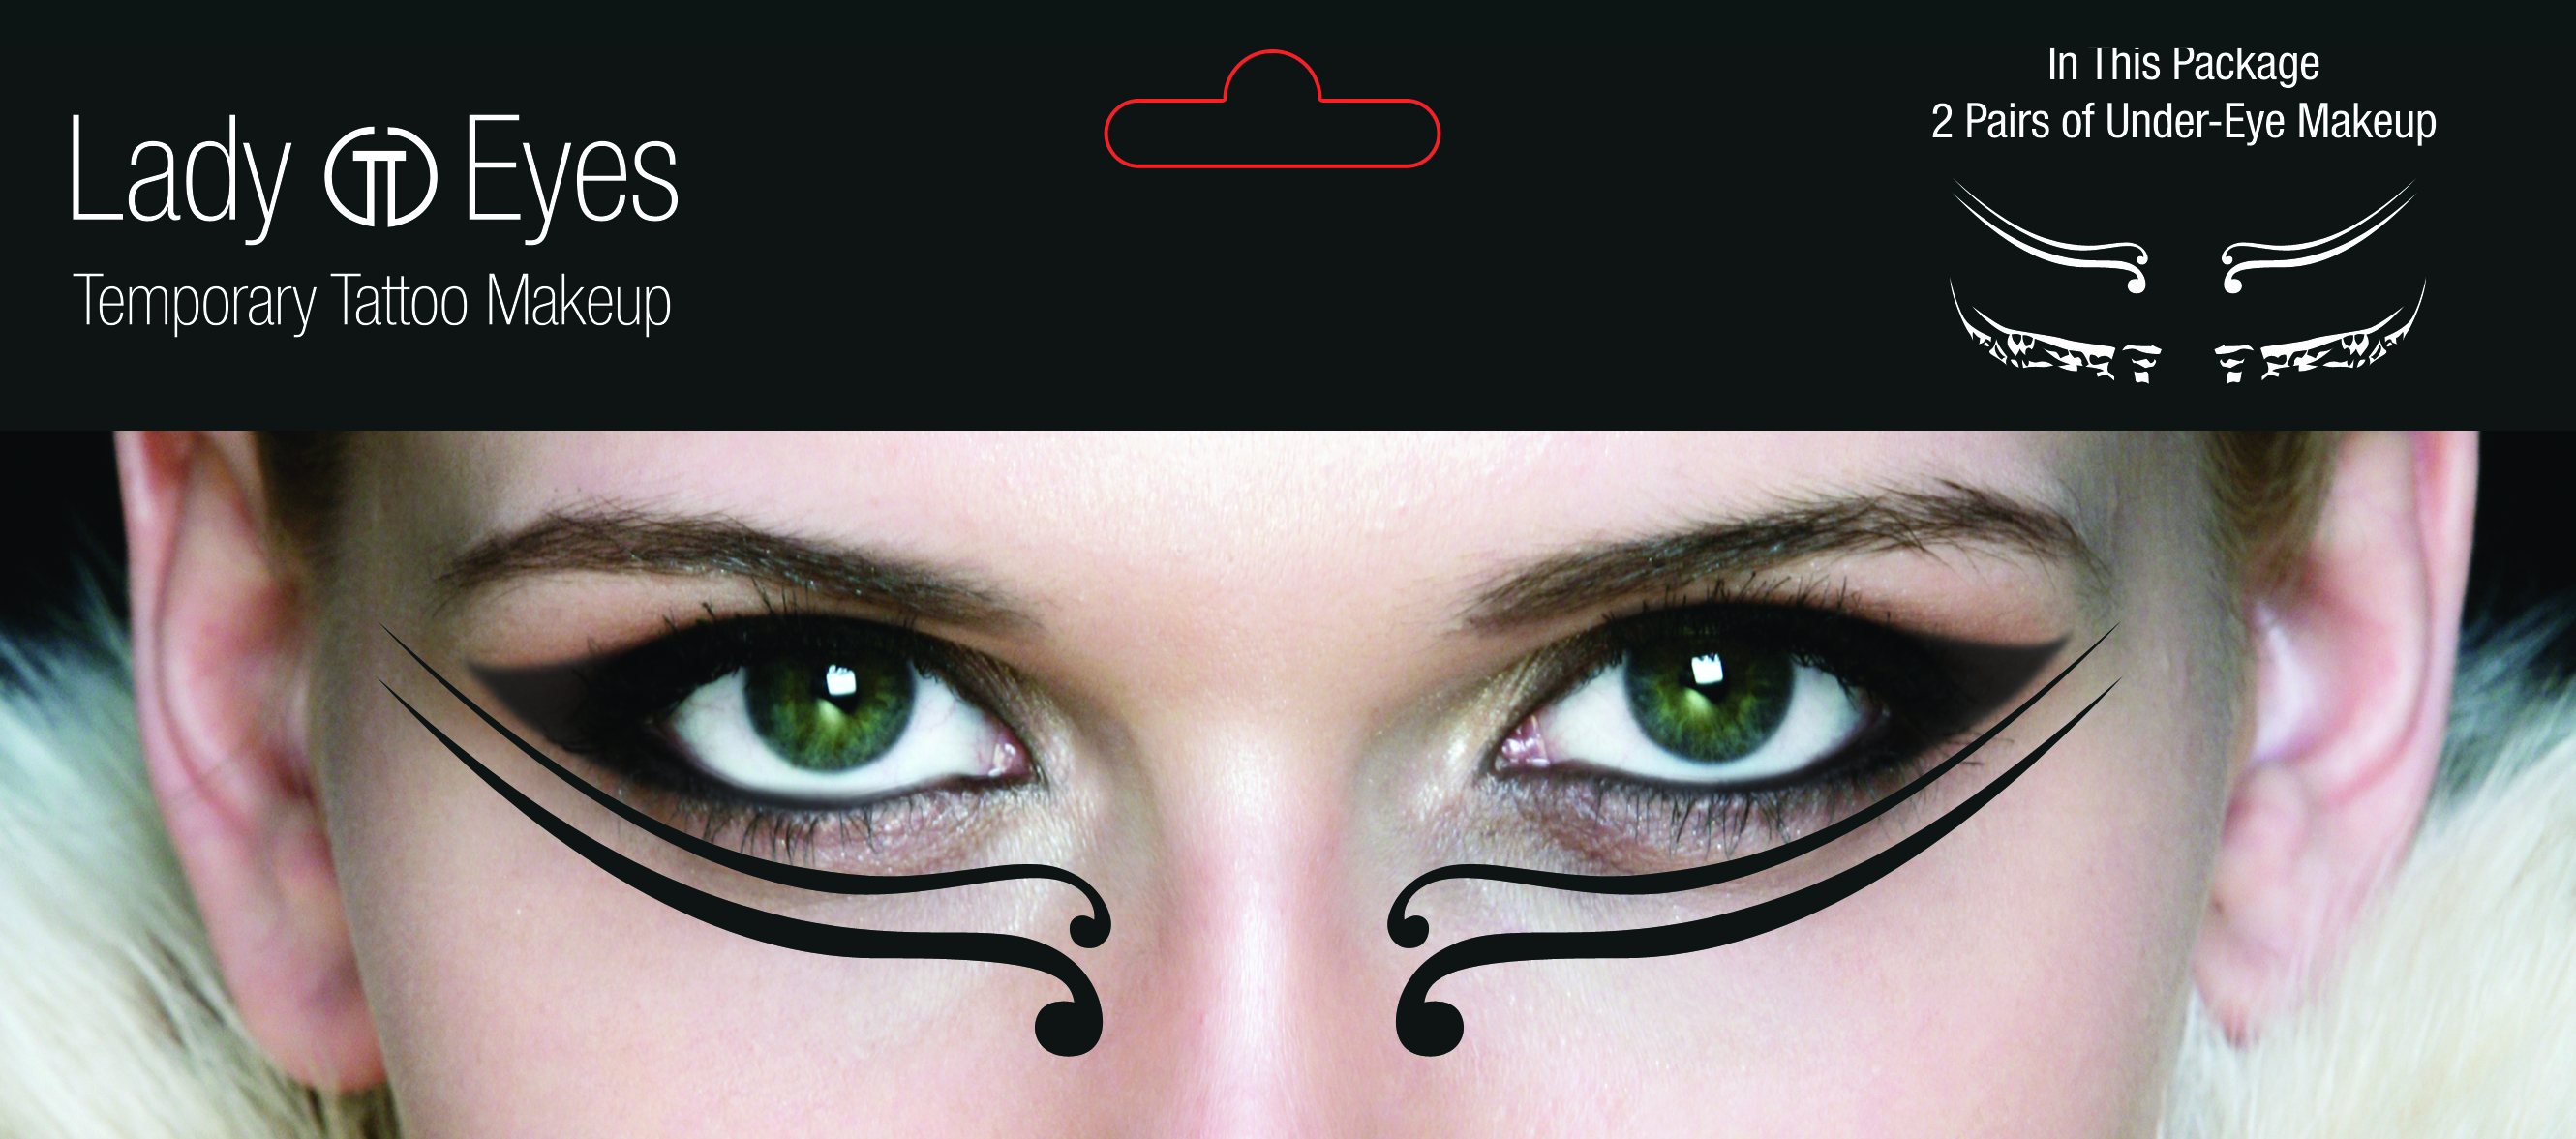 Eye temporary tattoo makeup